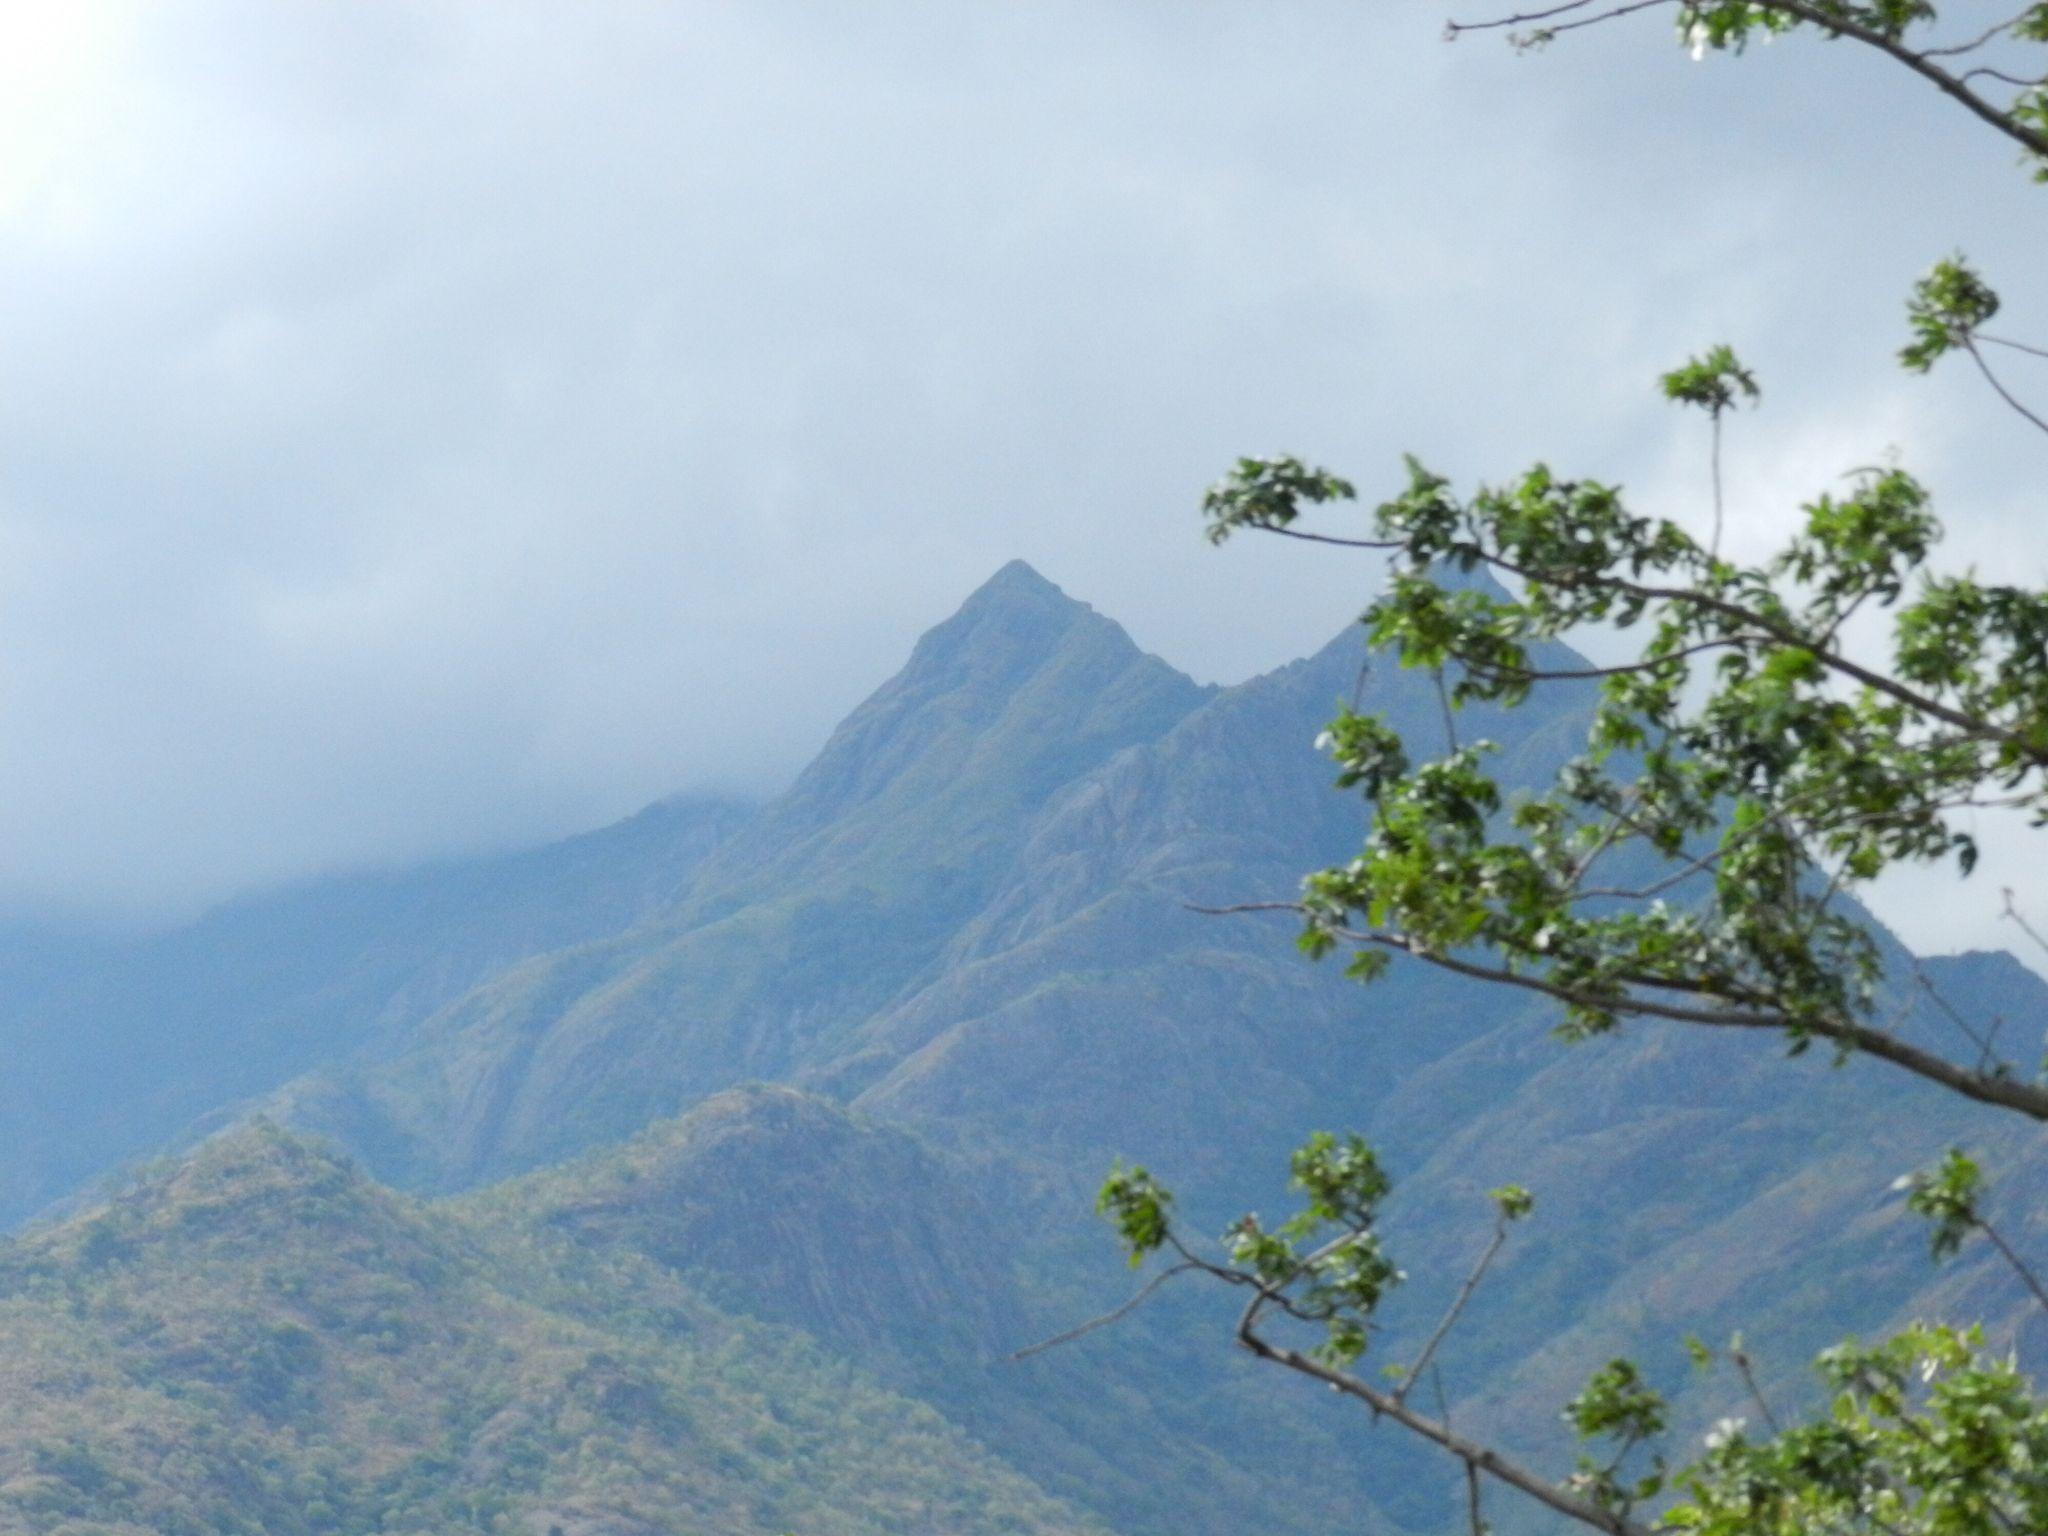 Mighty hills by PRAVEENBALAJI